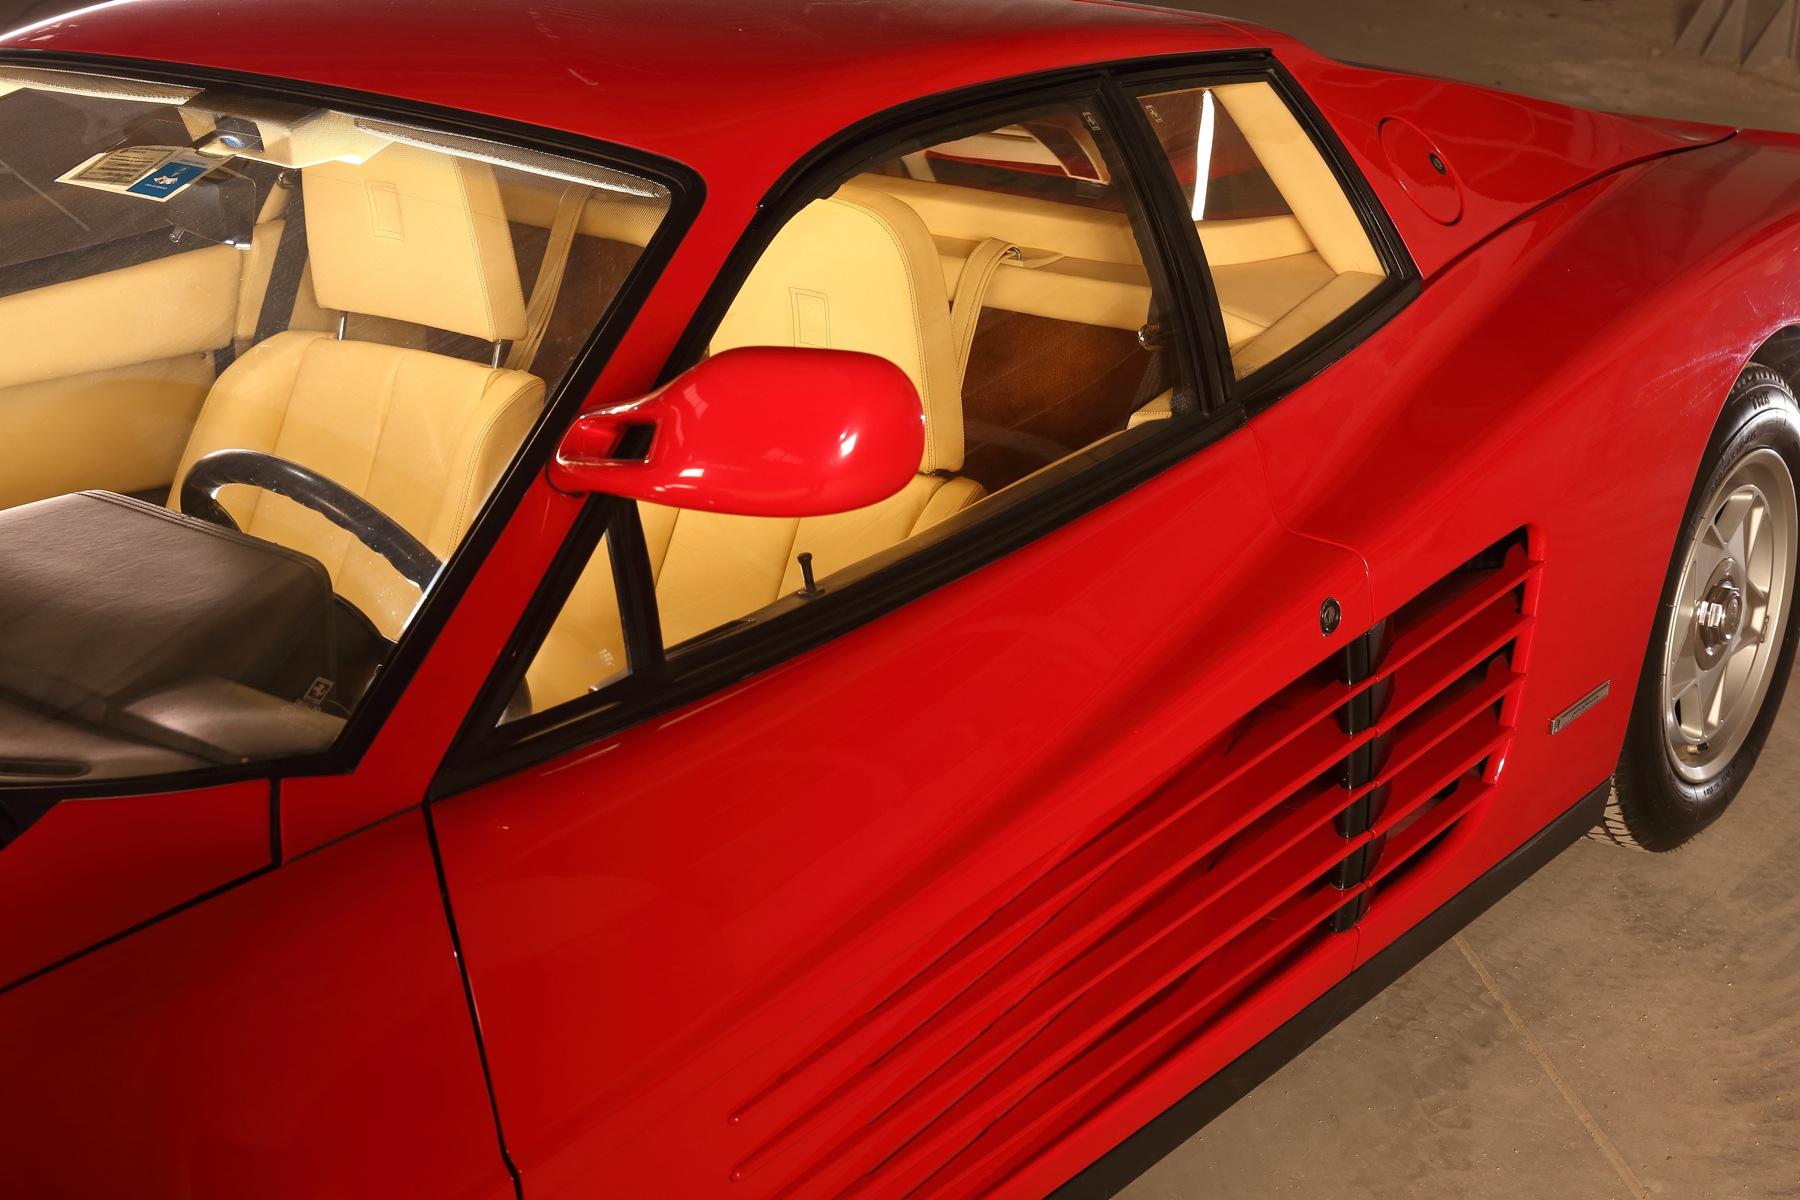 004 2016_03_16_Ferrari Testarossa I 029